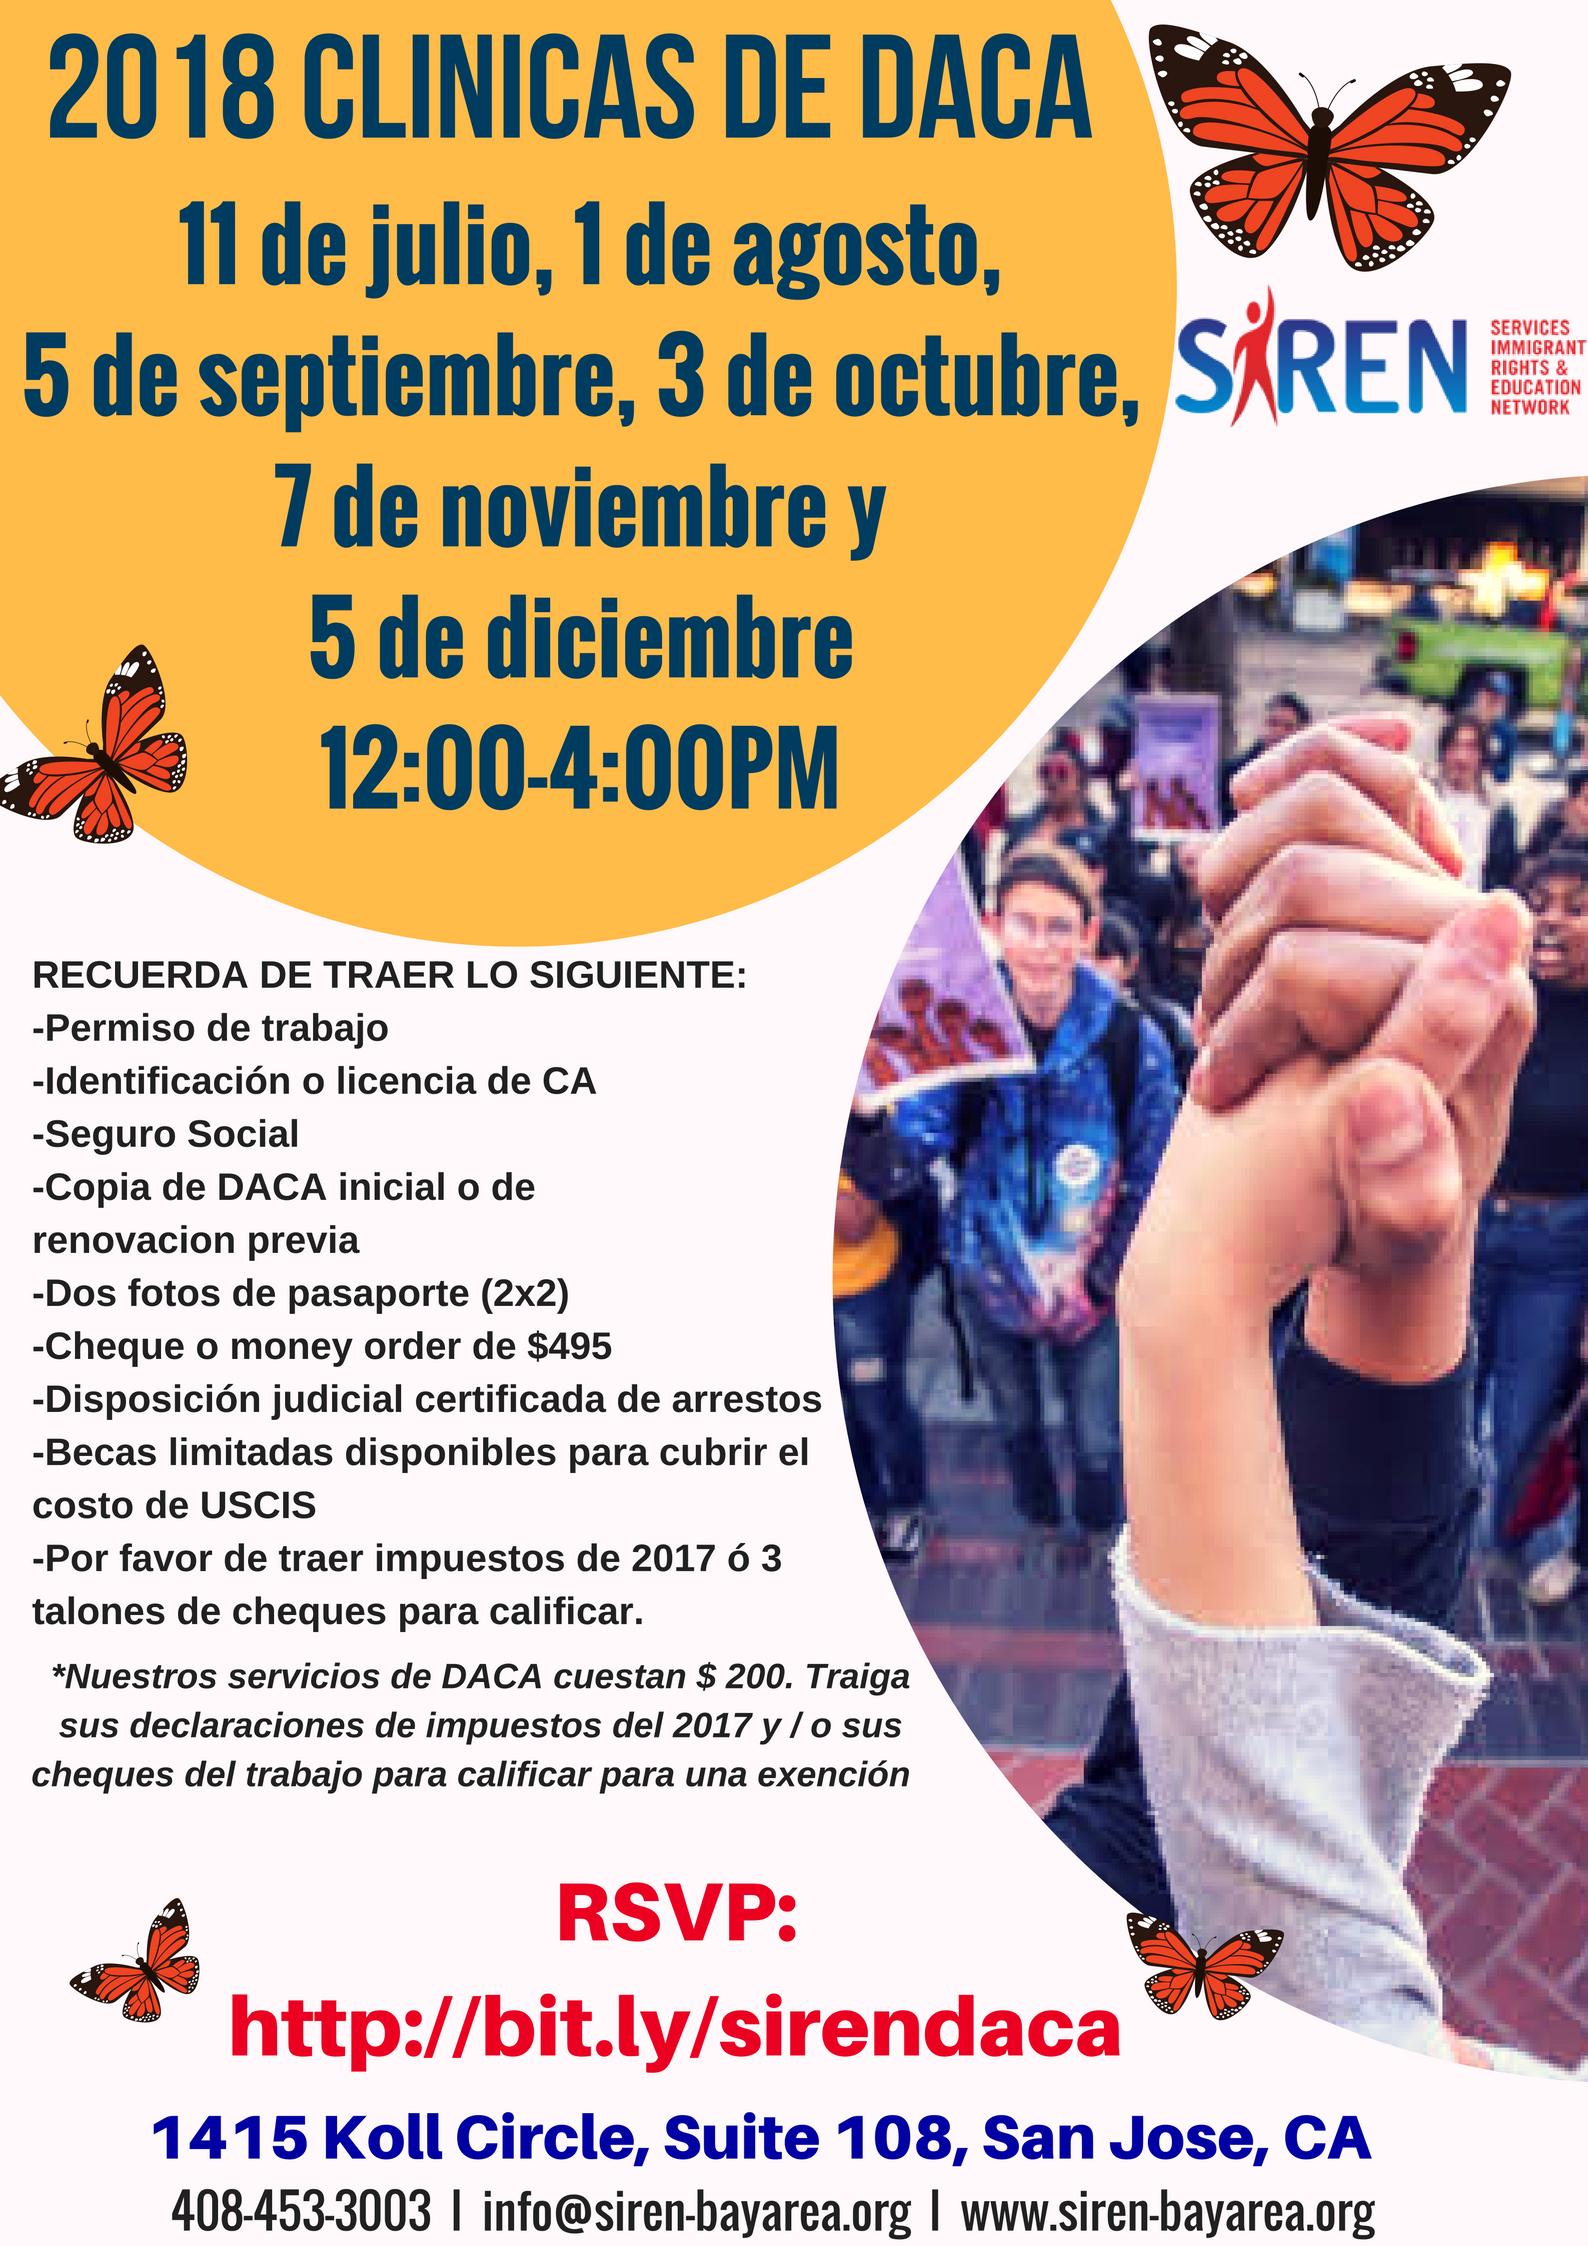 2018 DACA clinic spanish flyer.jpg